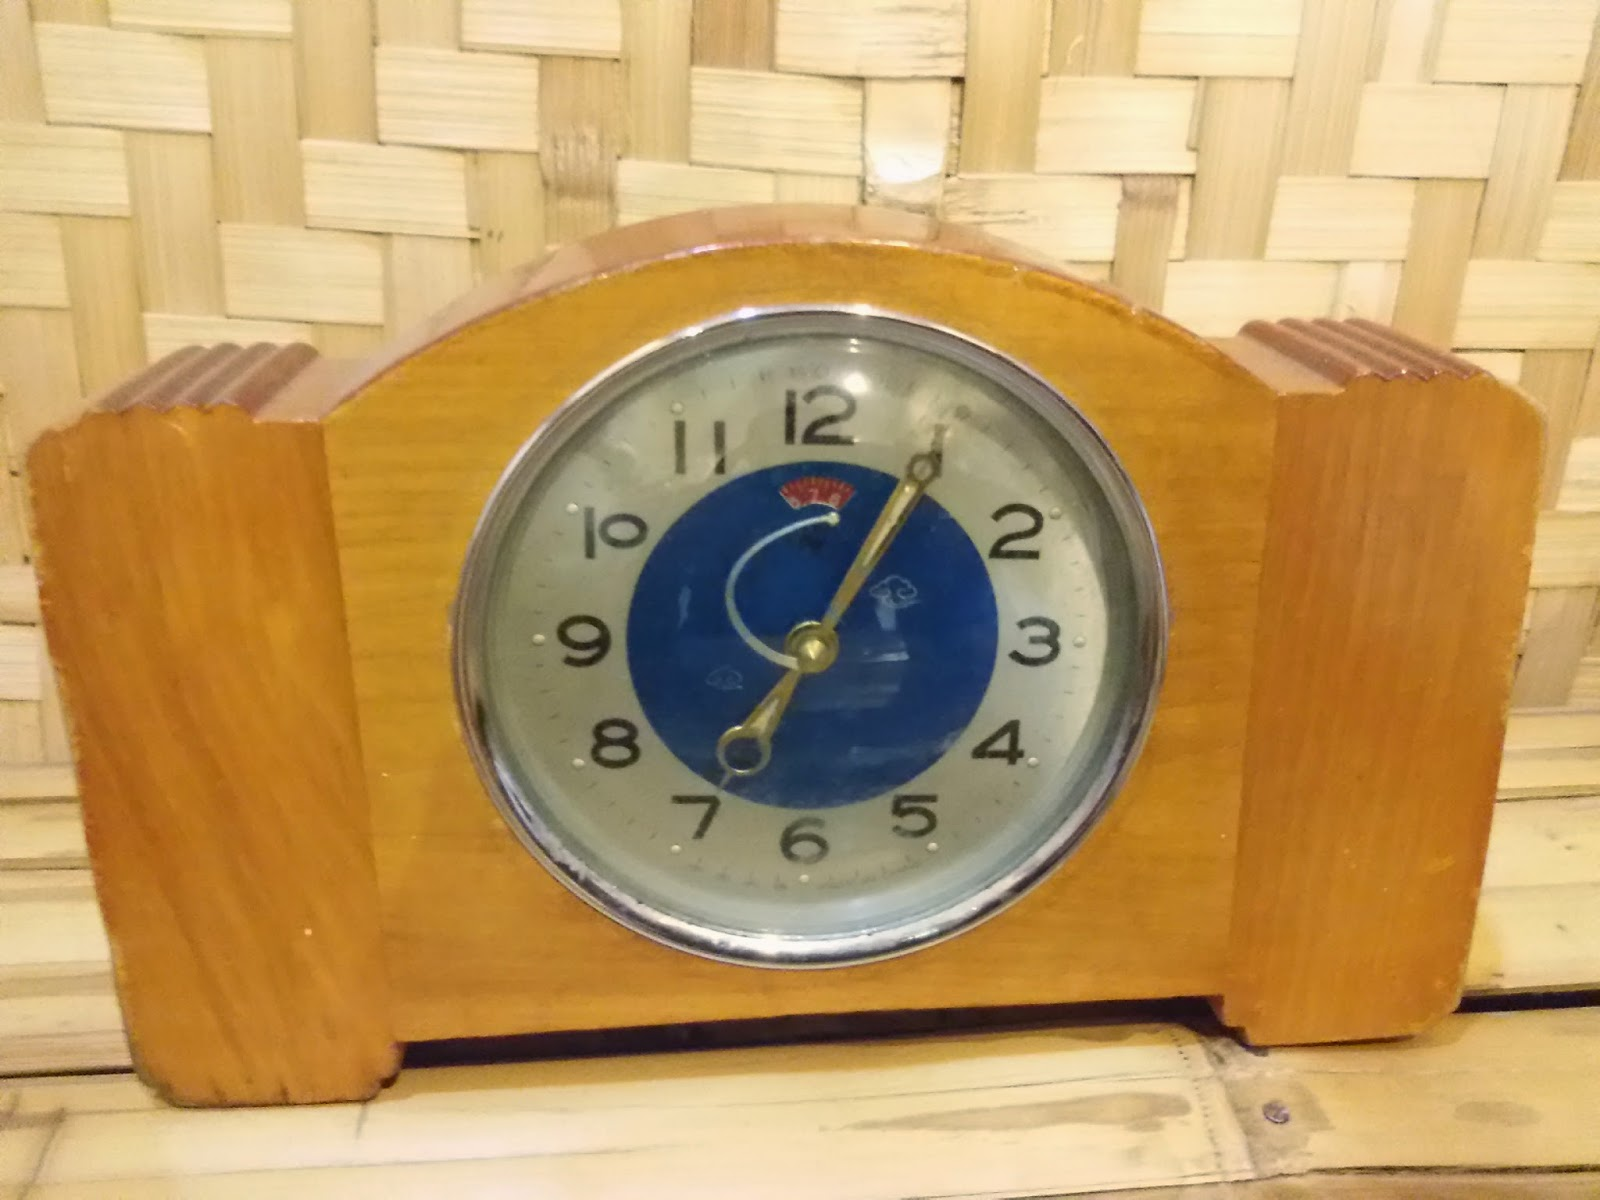 jam kayu ini merupakan barang antik untuk menunjukkan waktu pada jamannya. jam antik ini dapat dijadikan sebagai jam weker antik karena terdapat alarm dan dapat di setel alarmnya. dapatkan di kunojaoel.blogspot.com